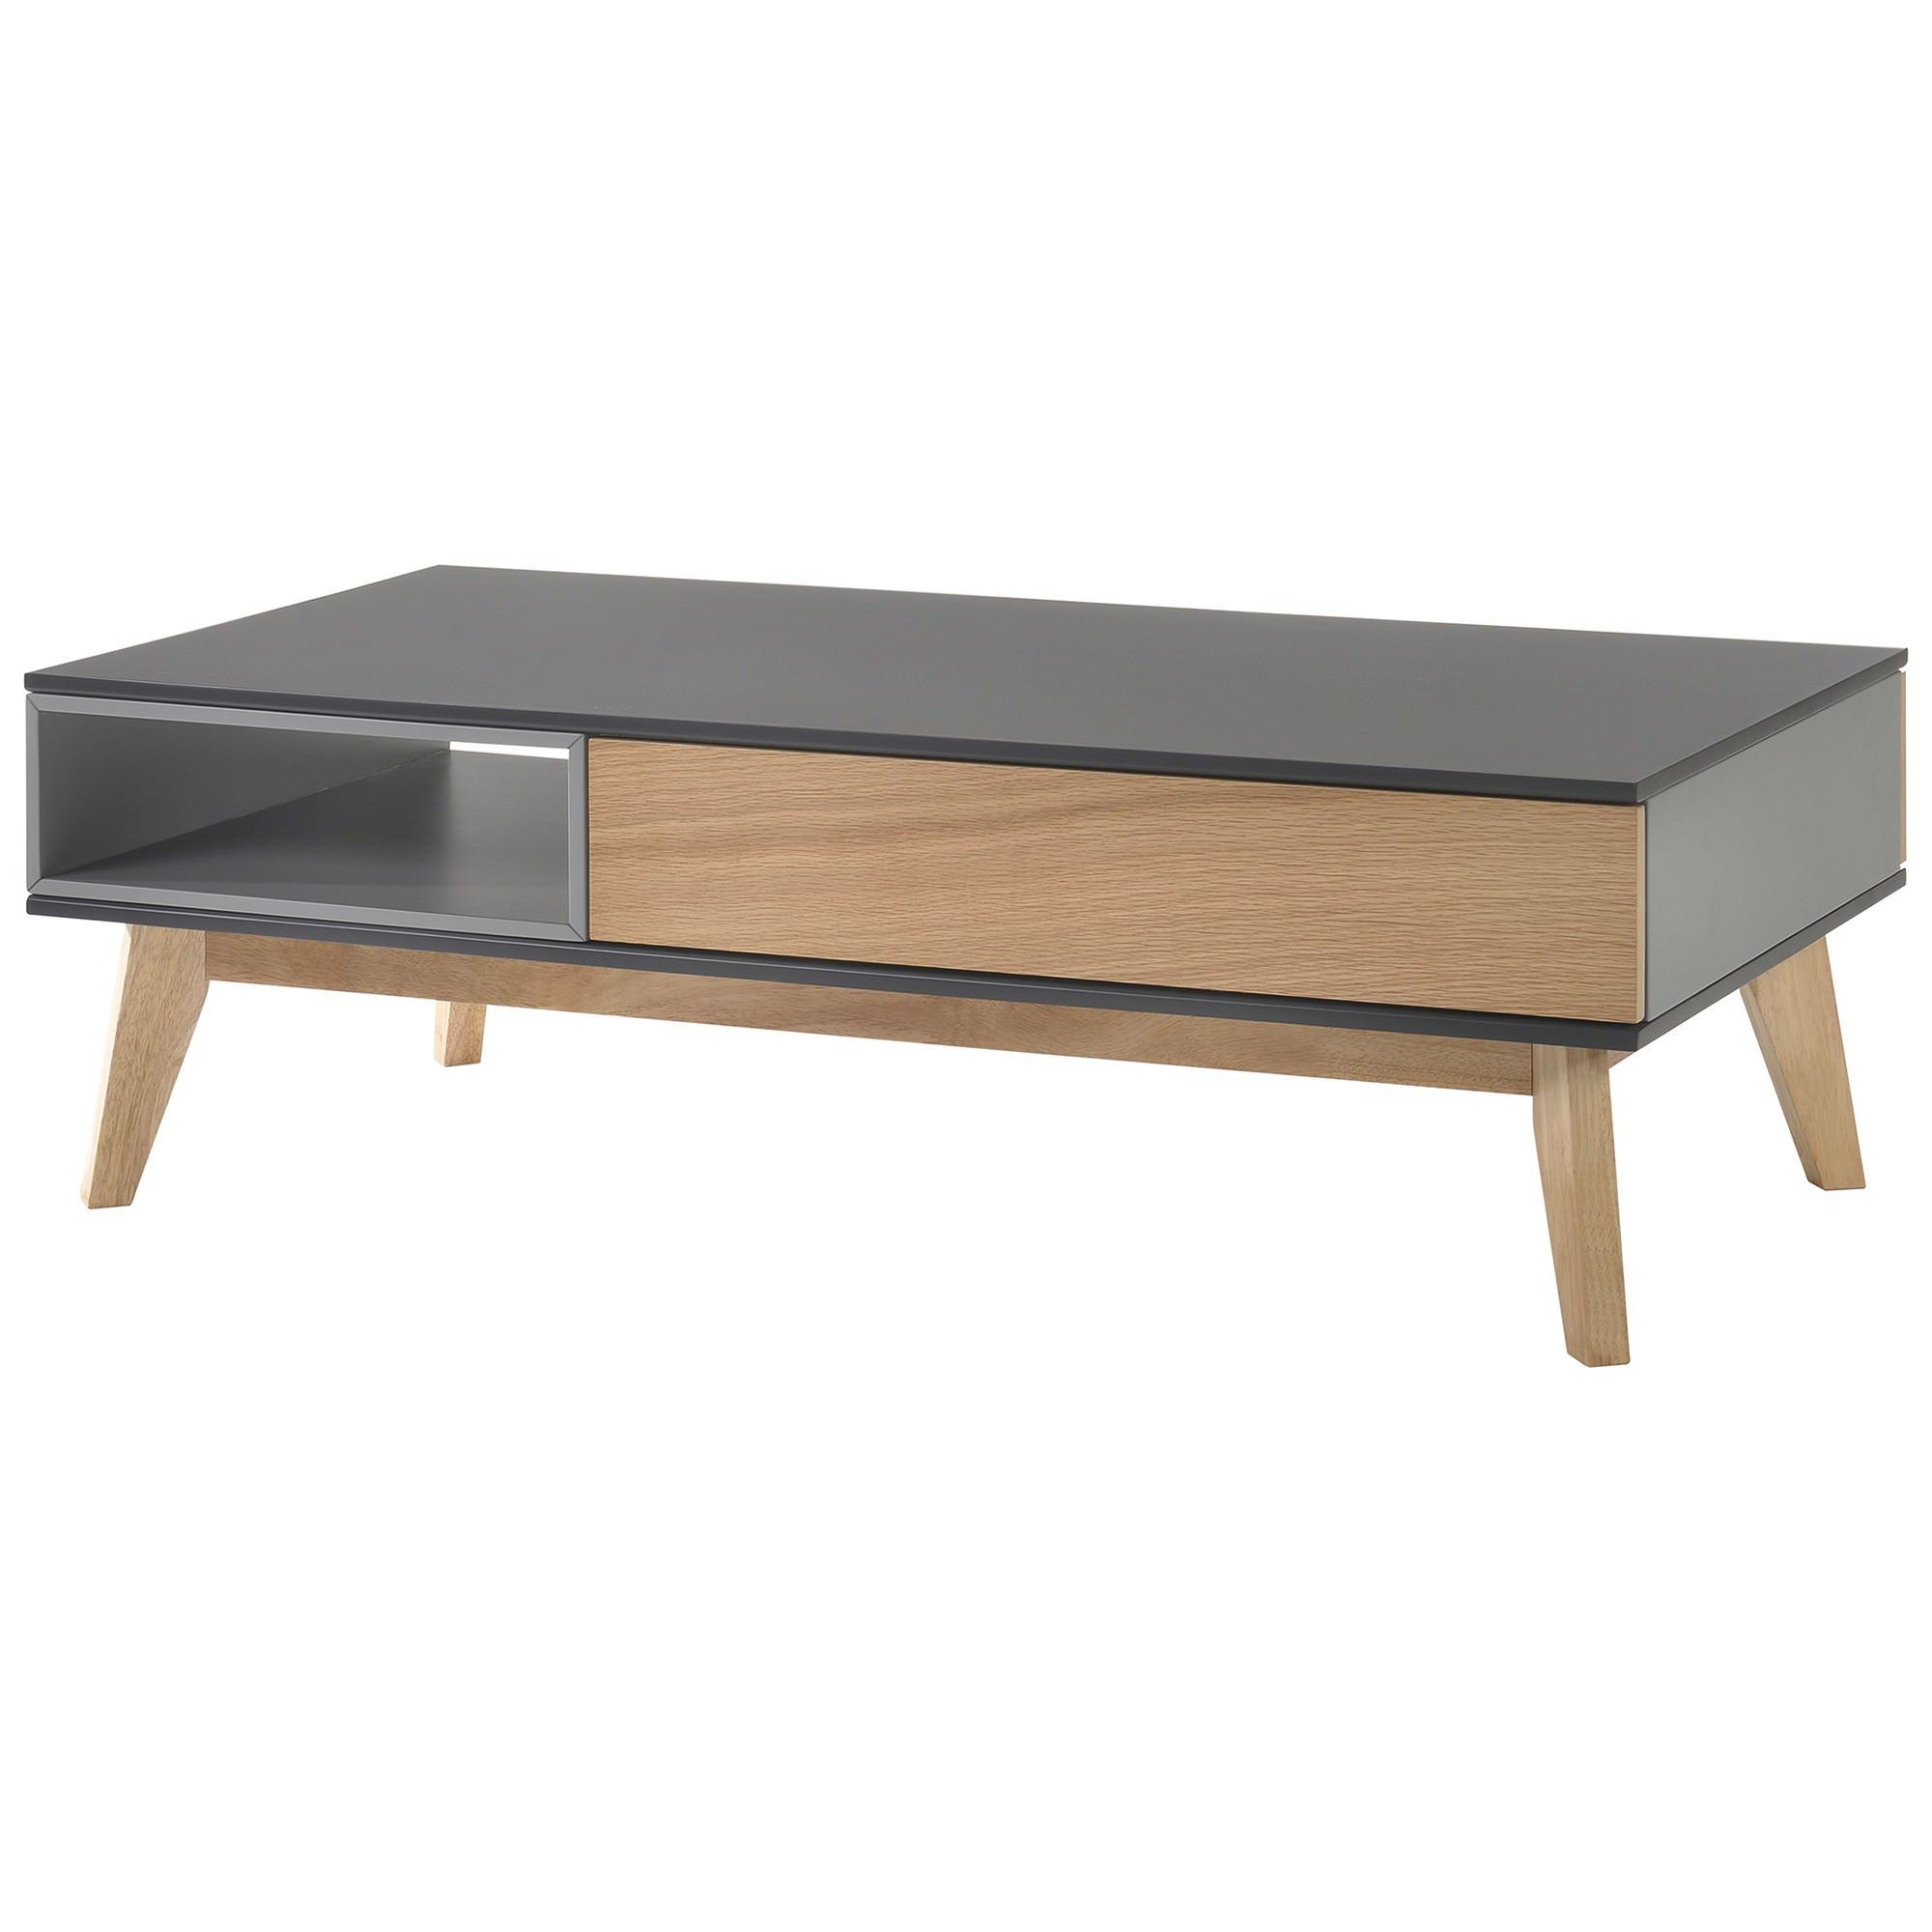 Rumi Coffee Table, 120cm